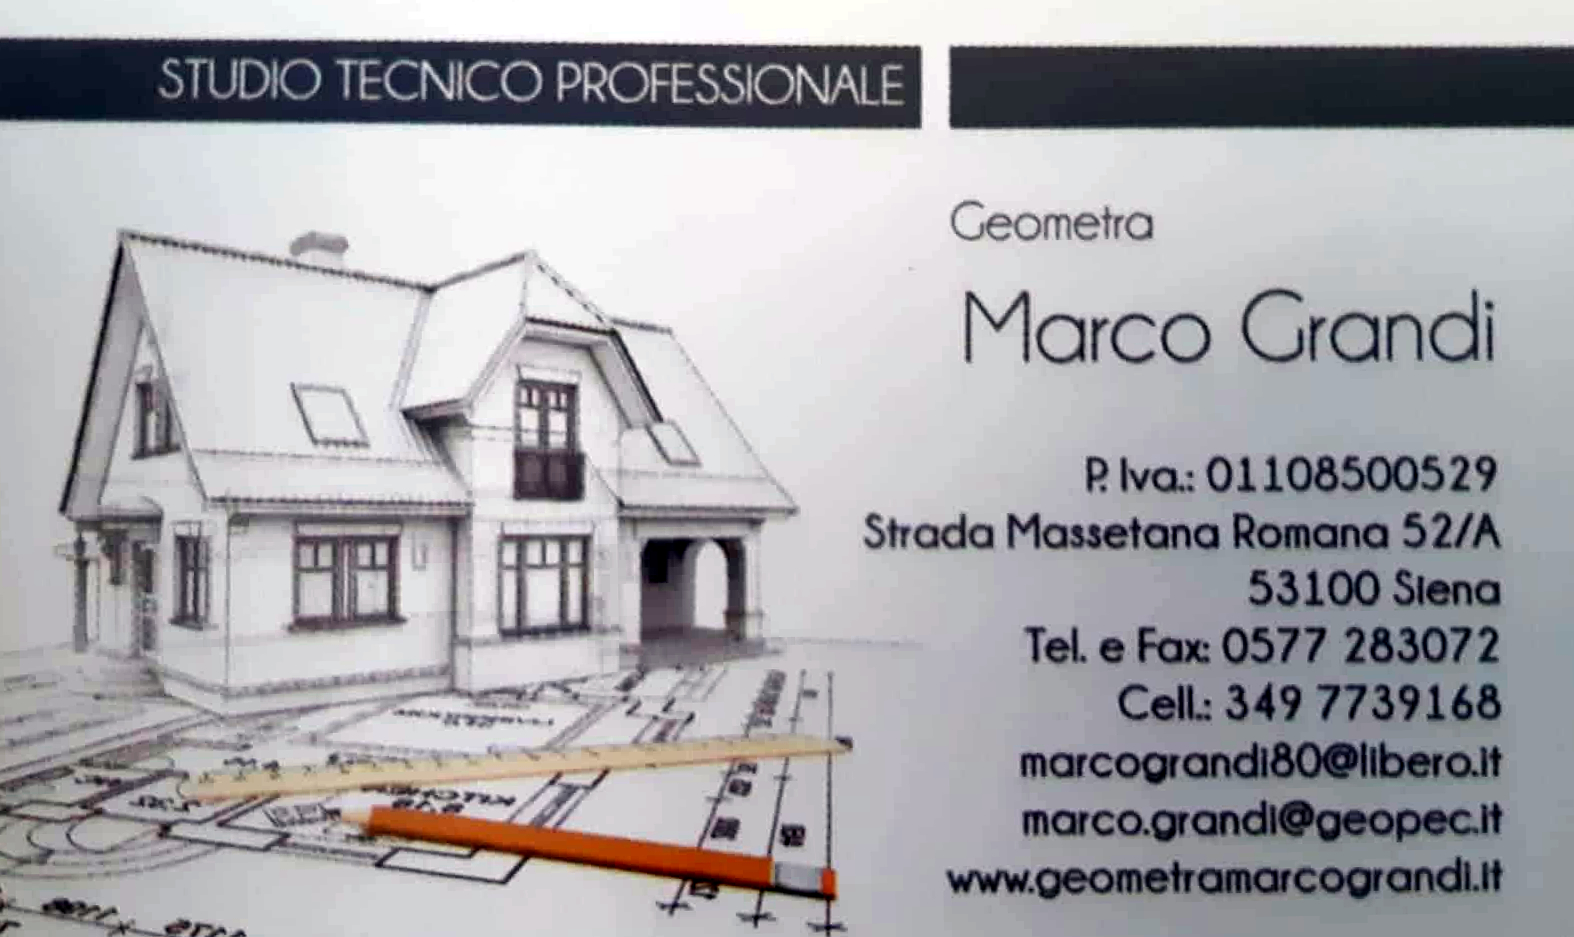 MARCO GRANDI GEOMETRA